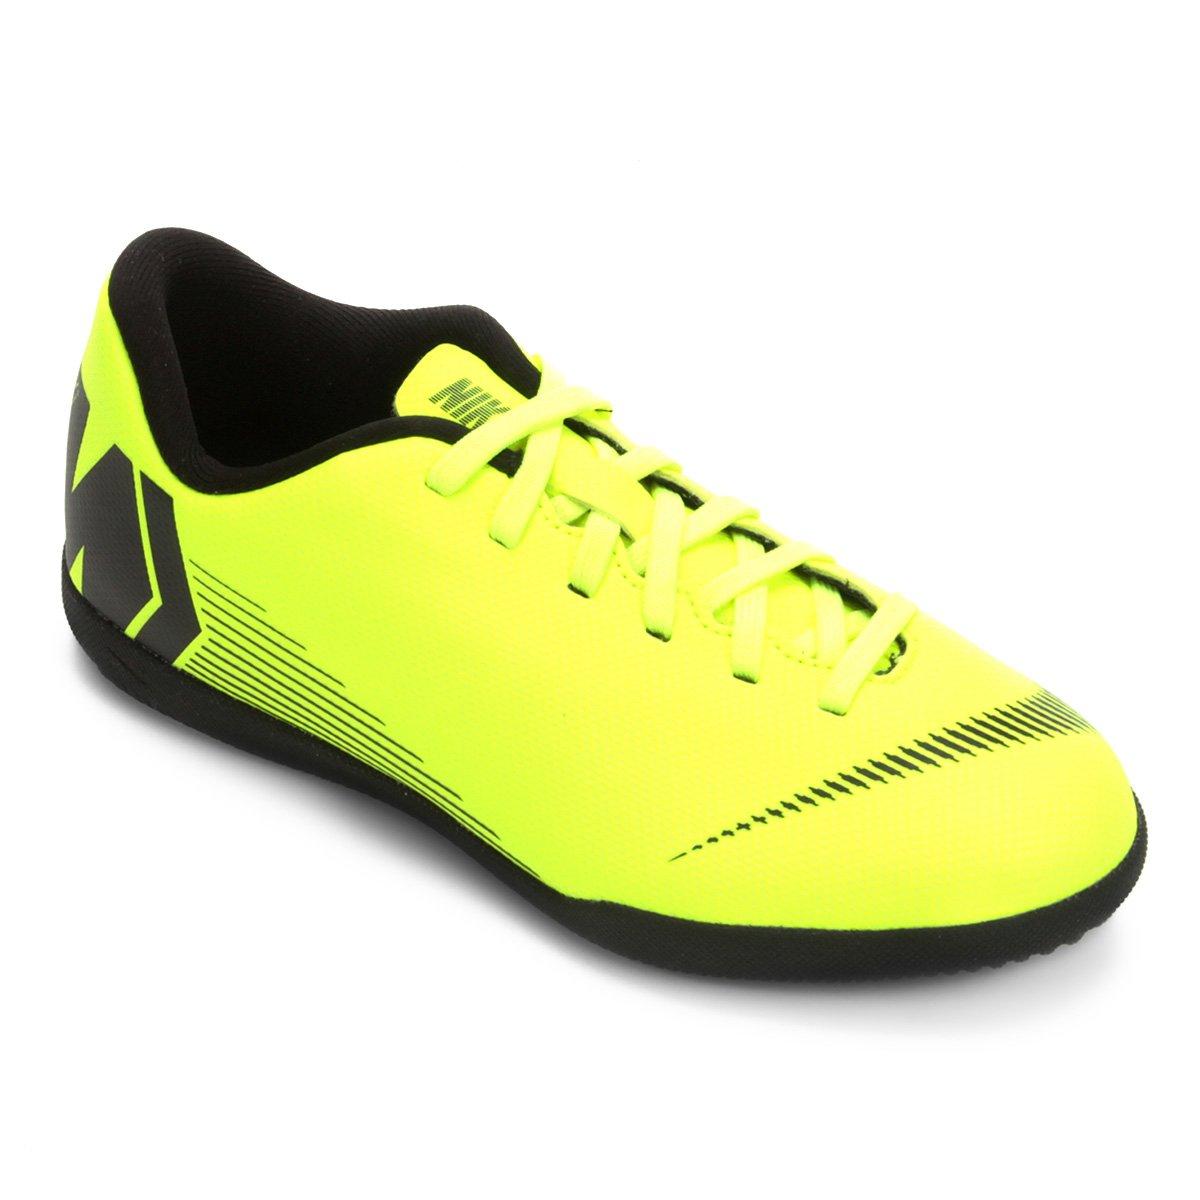 73788023fc Chuteira Futsal Infantil Nike Mercurial Vapor 12 Club - Verde e Preto